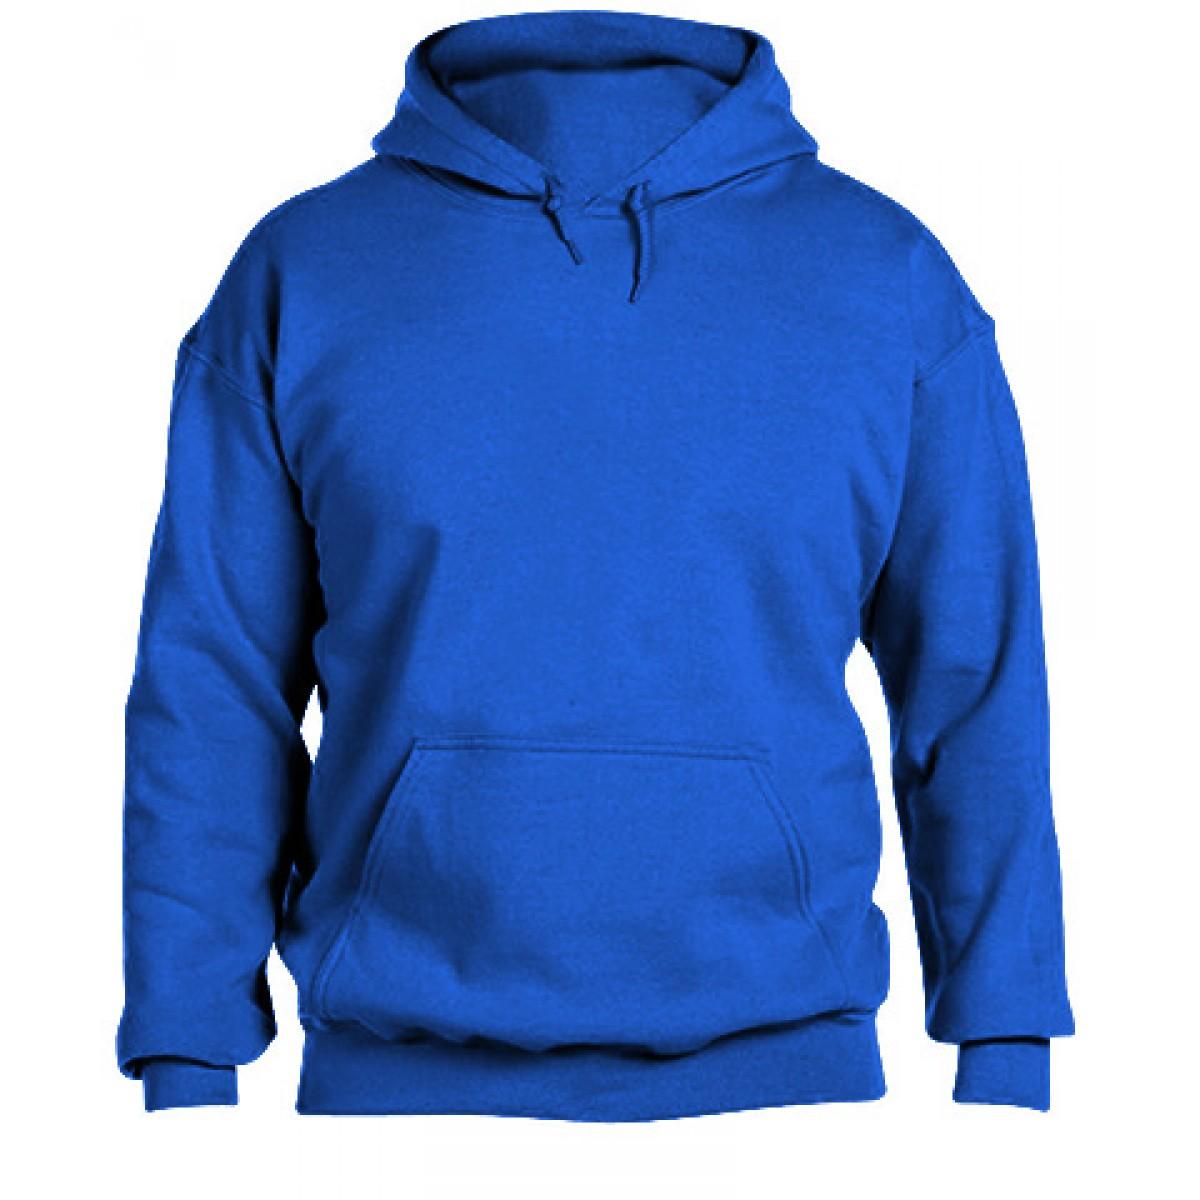 Hooded Sweatshirt 50/50 Heavy Blend-4XL